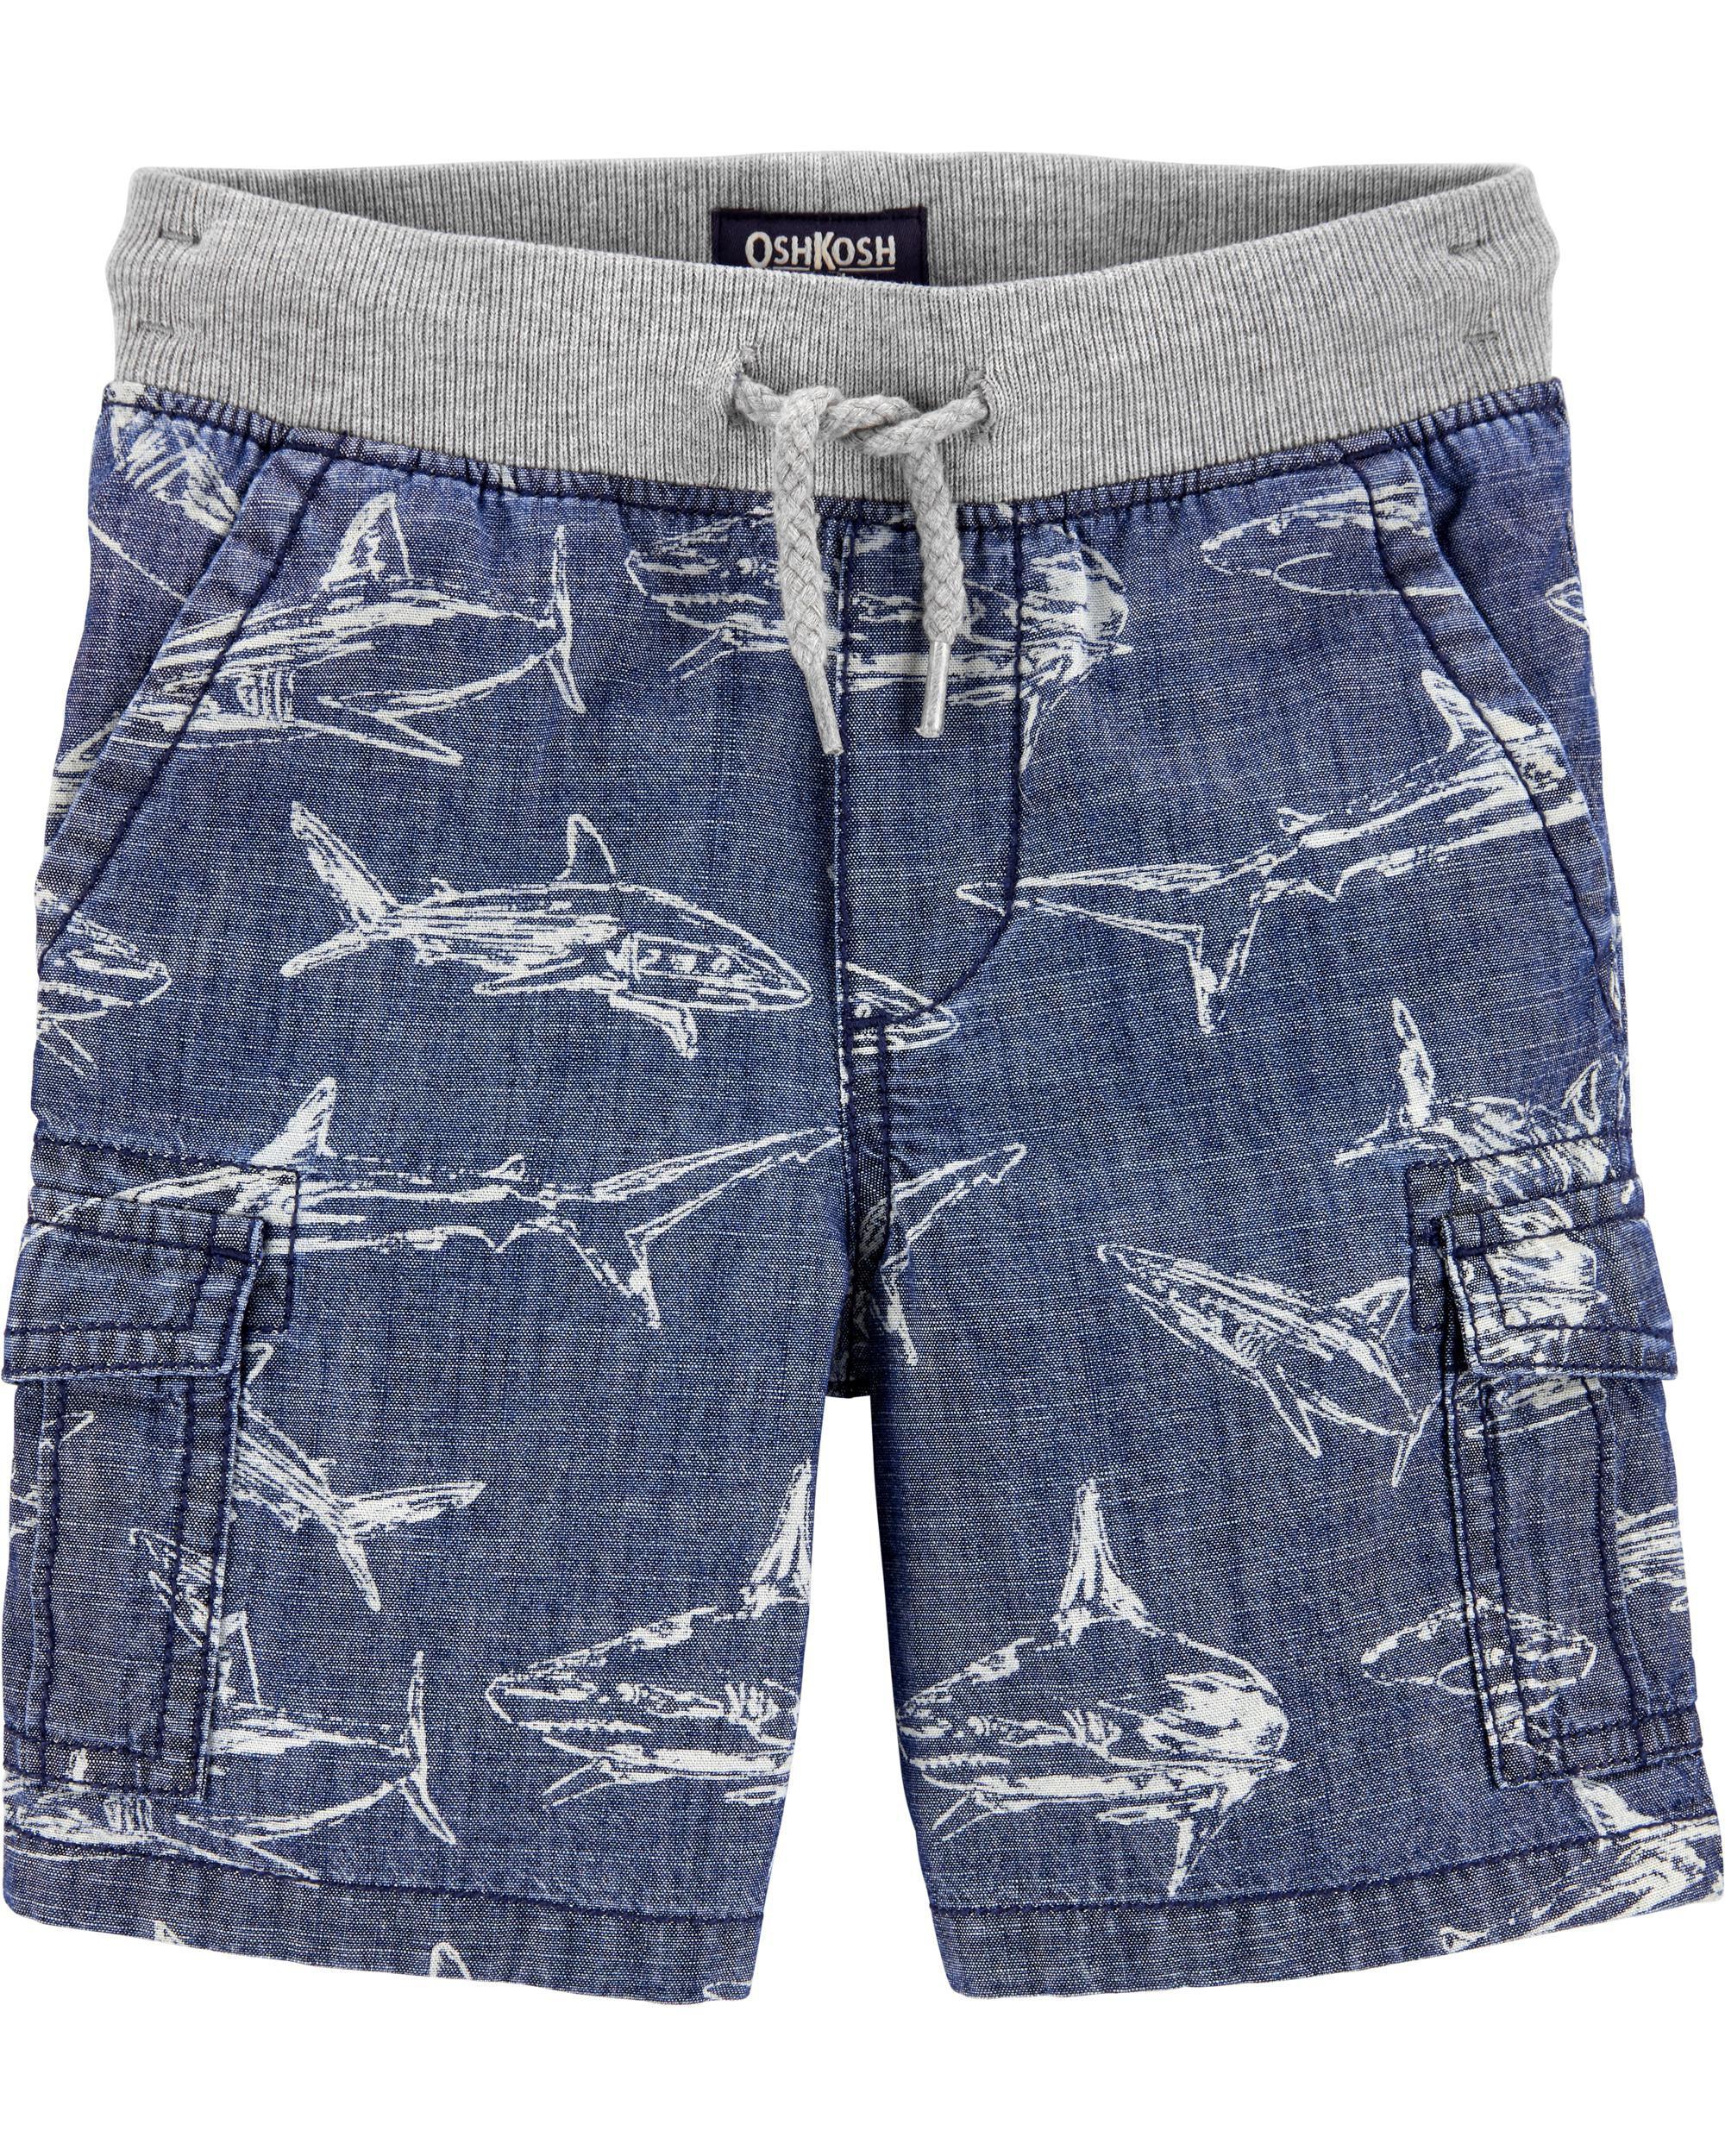 OshKosh Bgosh Cargo Shorts Print Toddler//Kid